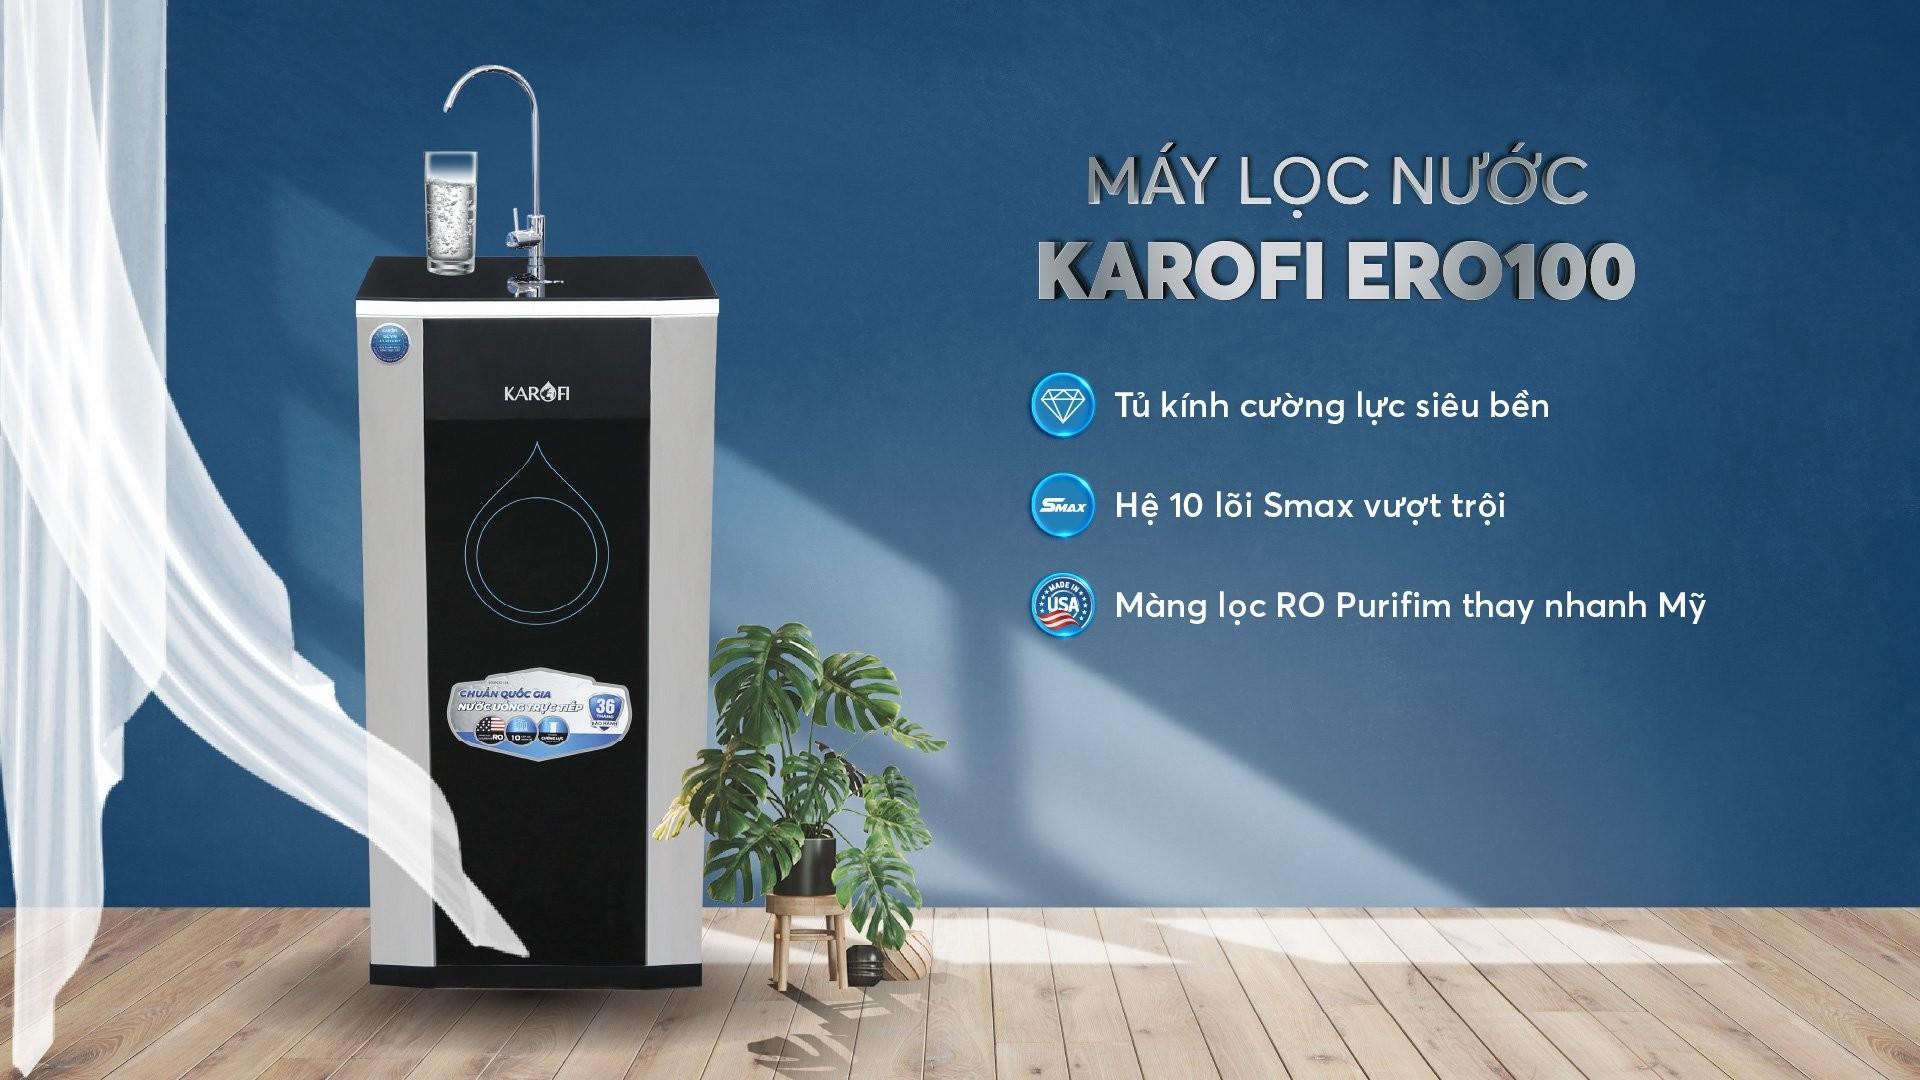 máy lọc nước karofi ERO100 10 lõi lọc